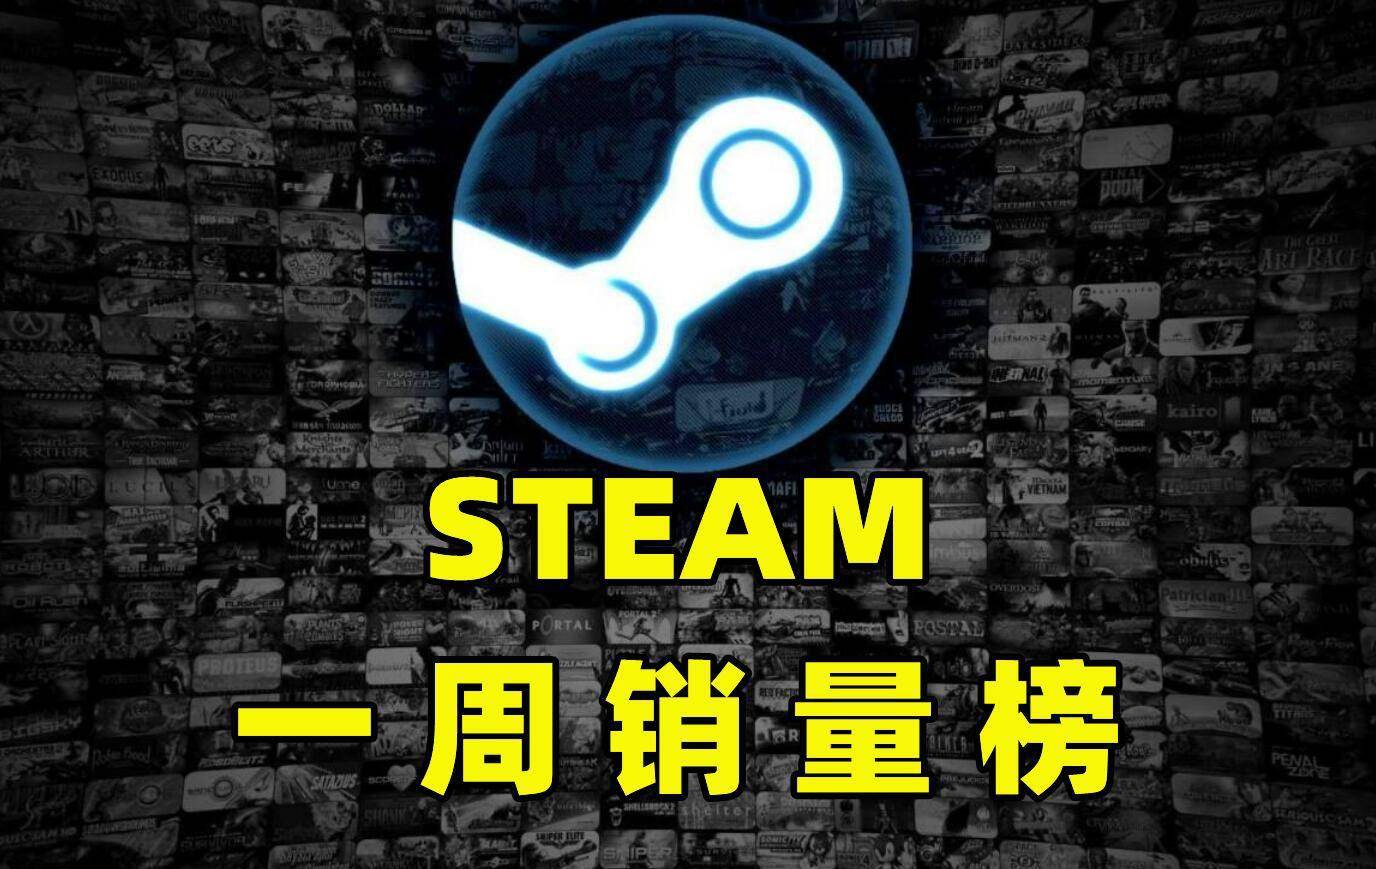 Steam一周销量榜:原价没人买的绅士游戏,骨折后10万LSP同时在线